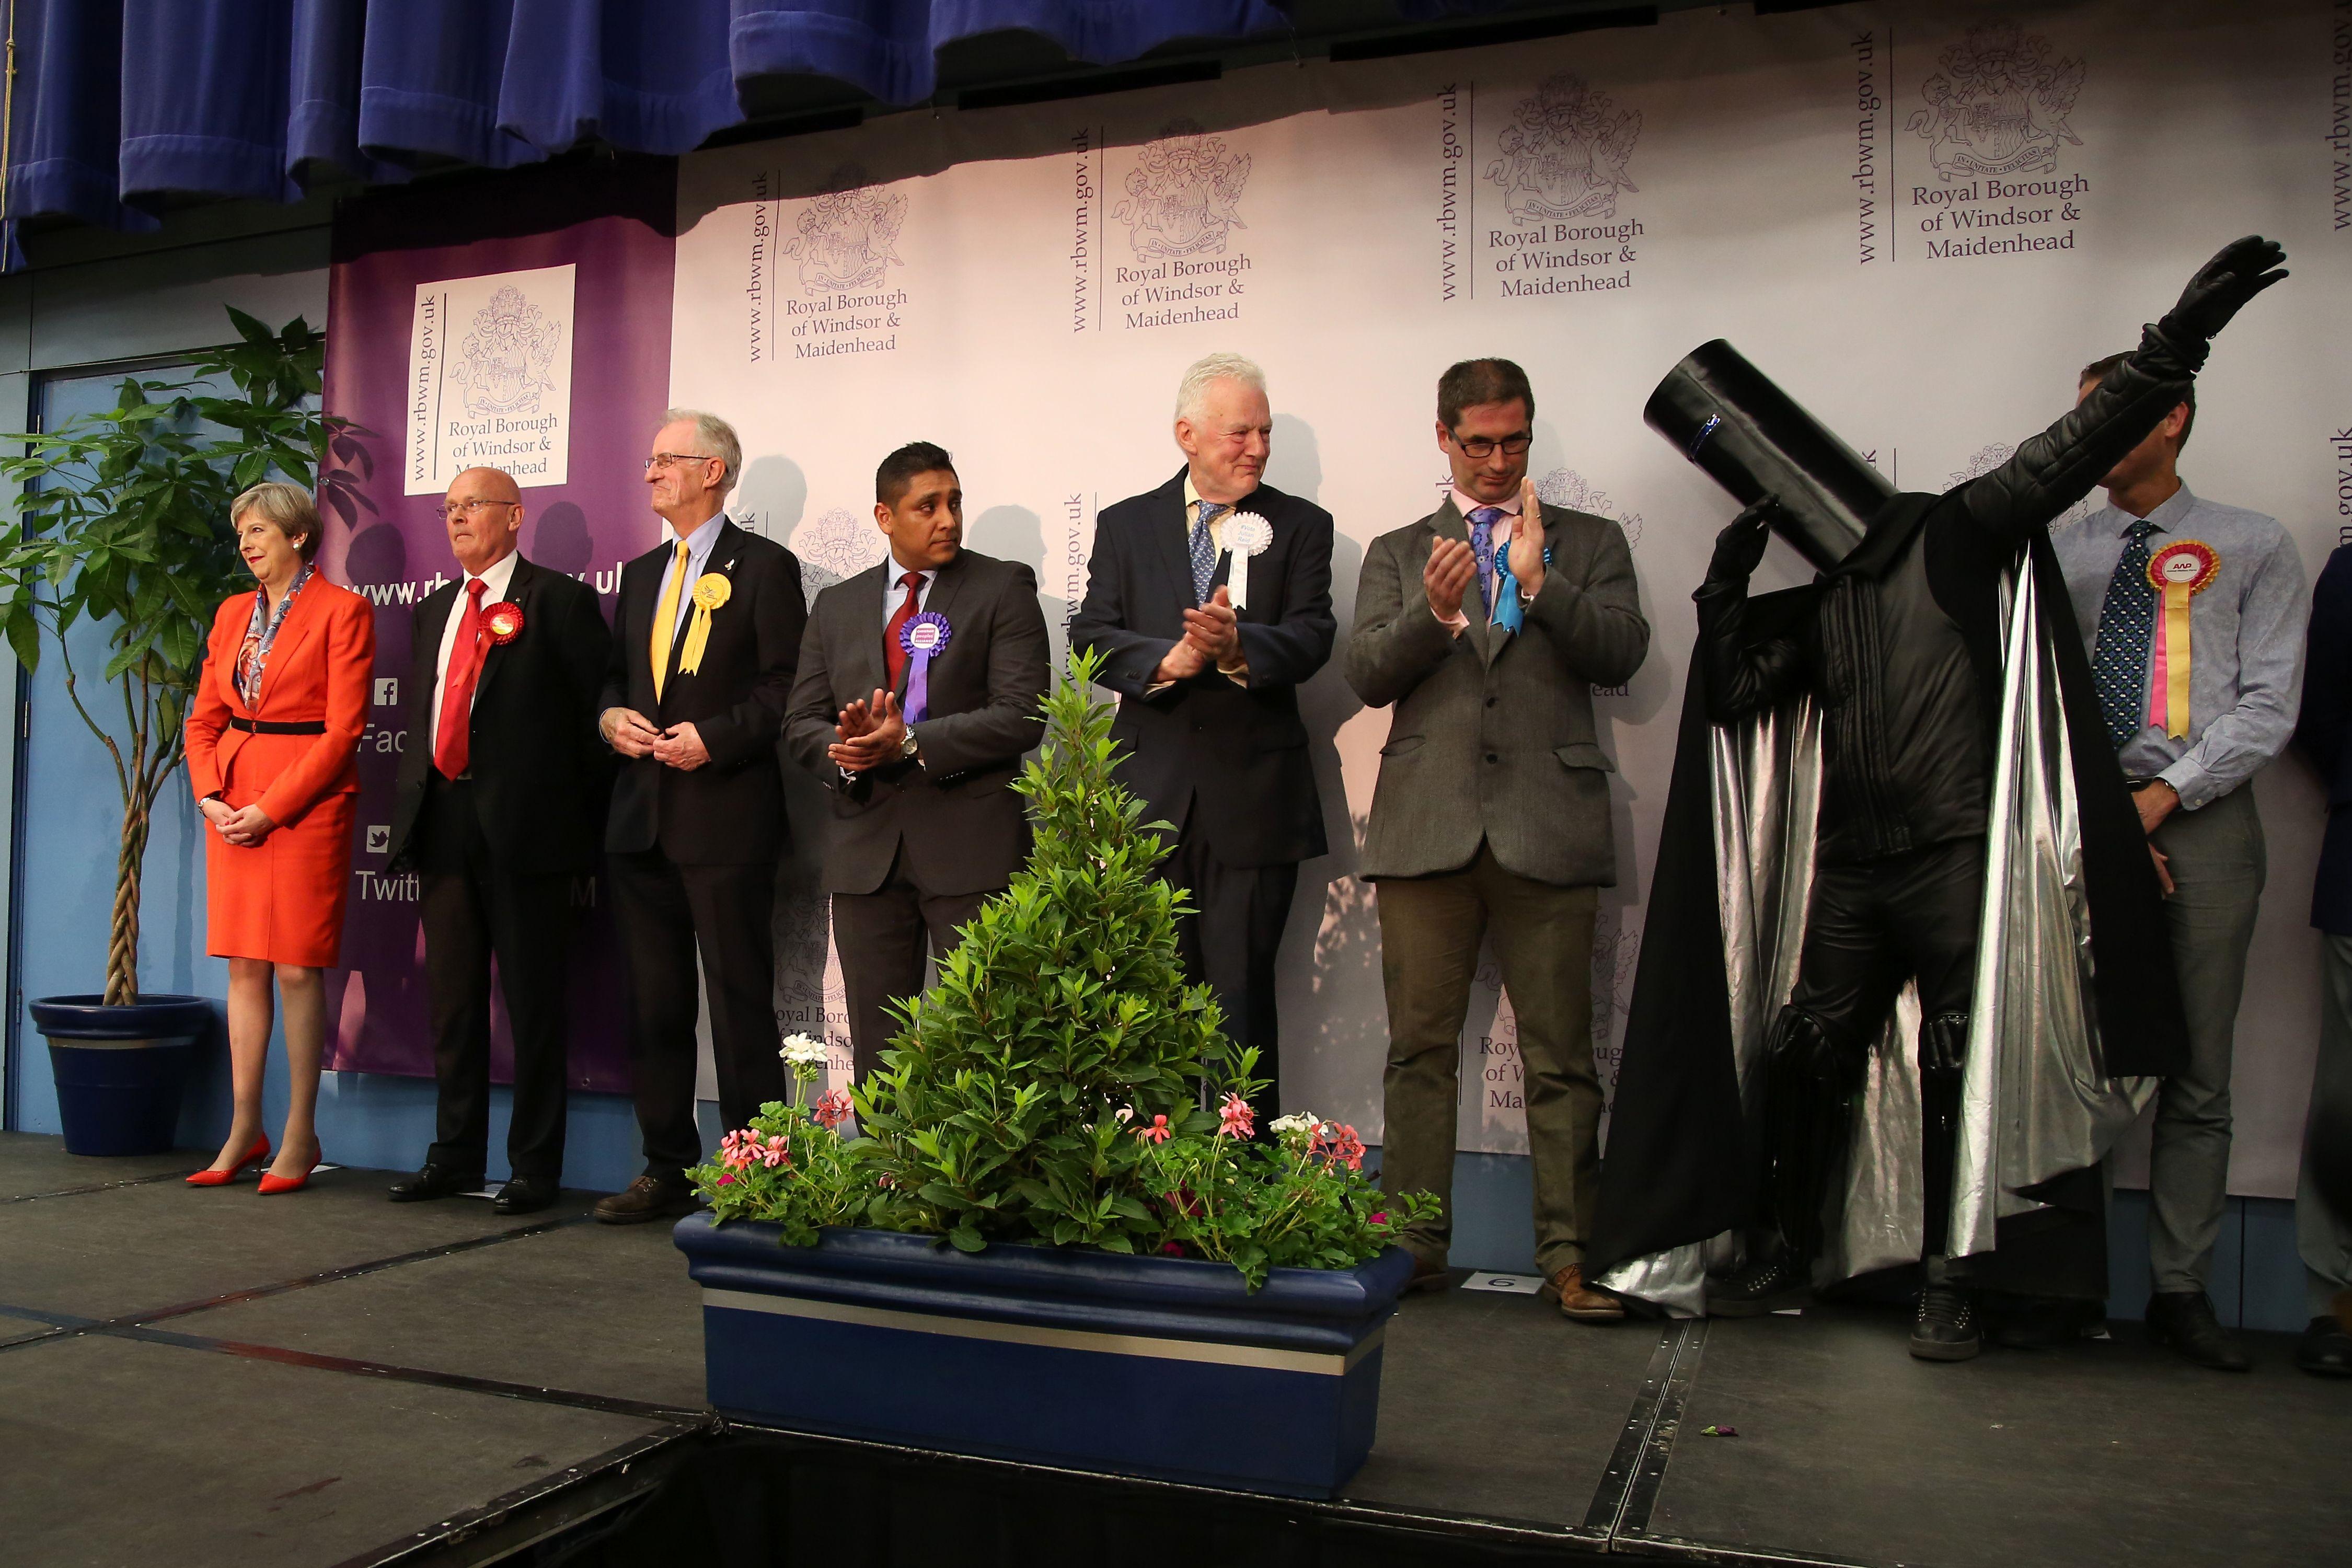 Maidenhead election Lord Buckethead